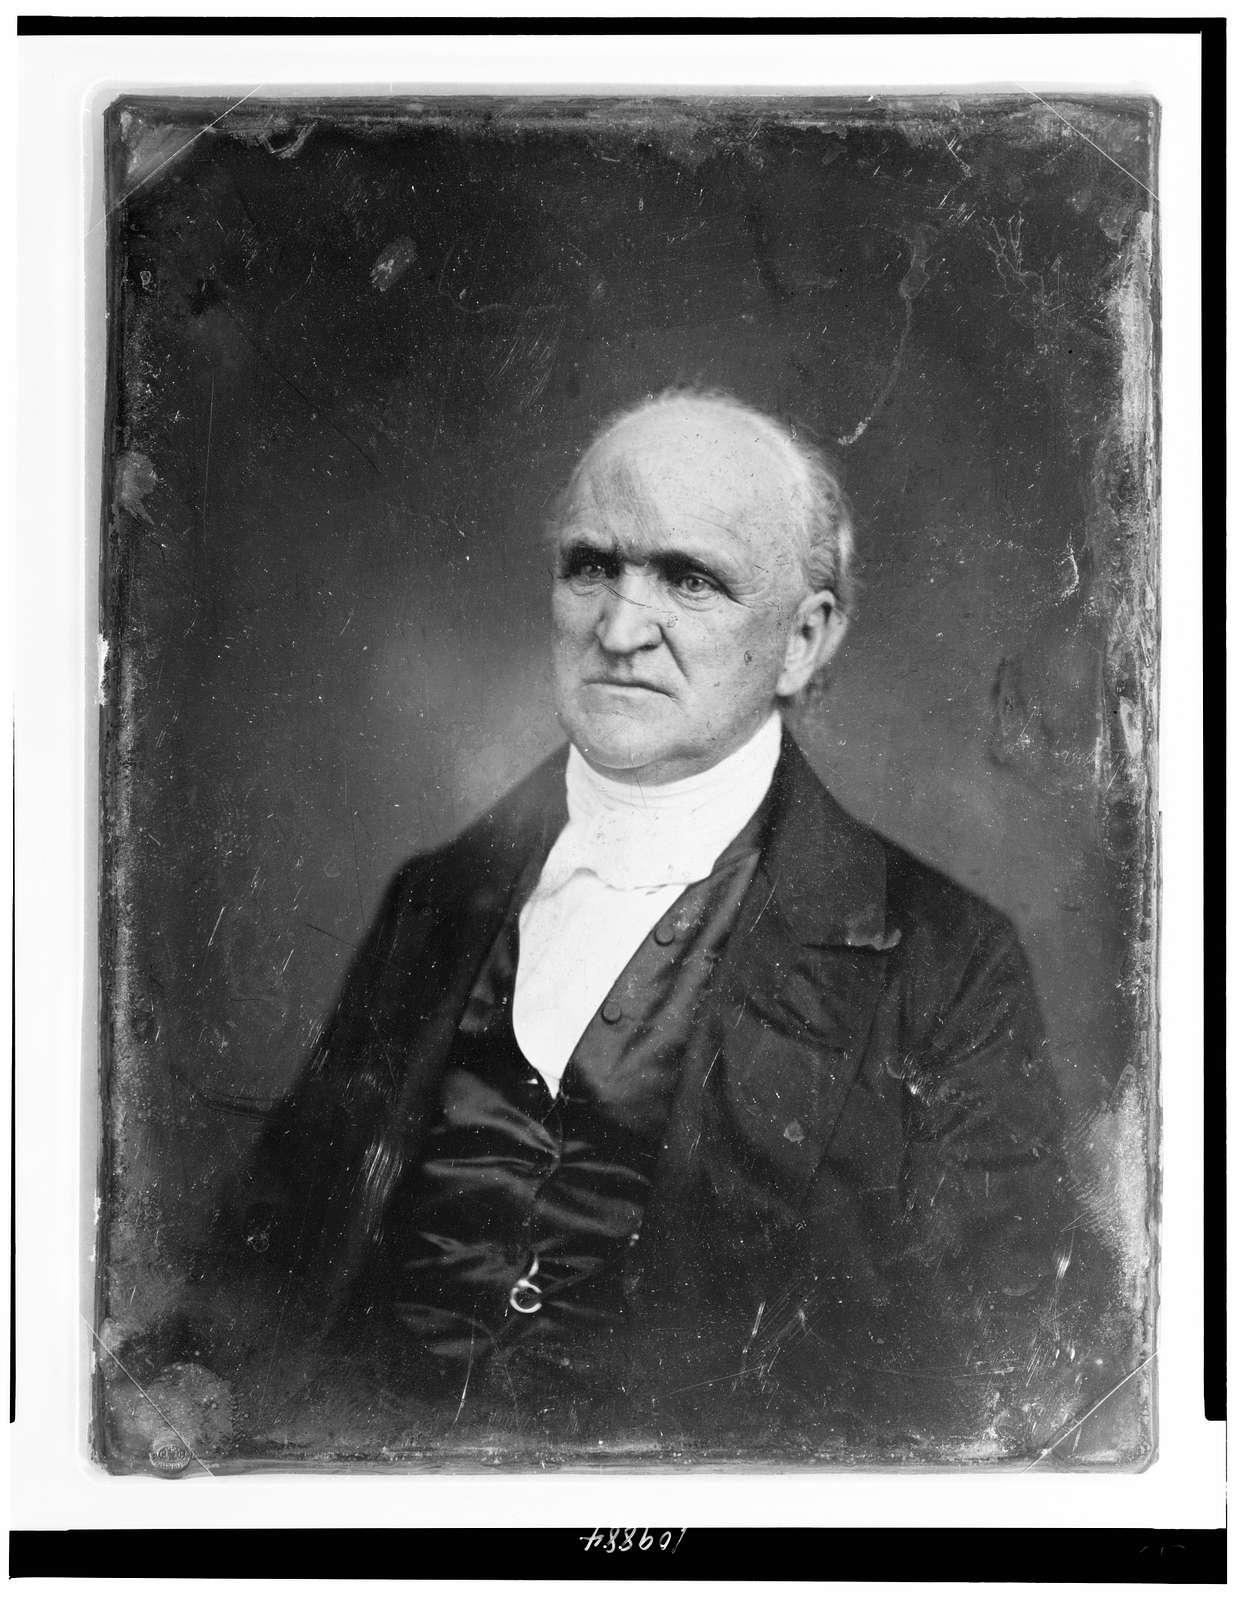 [Samuel Hanson Cox, half-length portrait, three-quarters to the left]